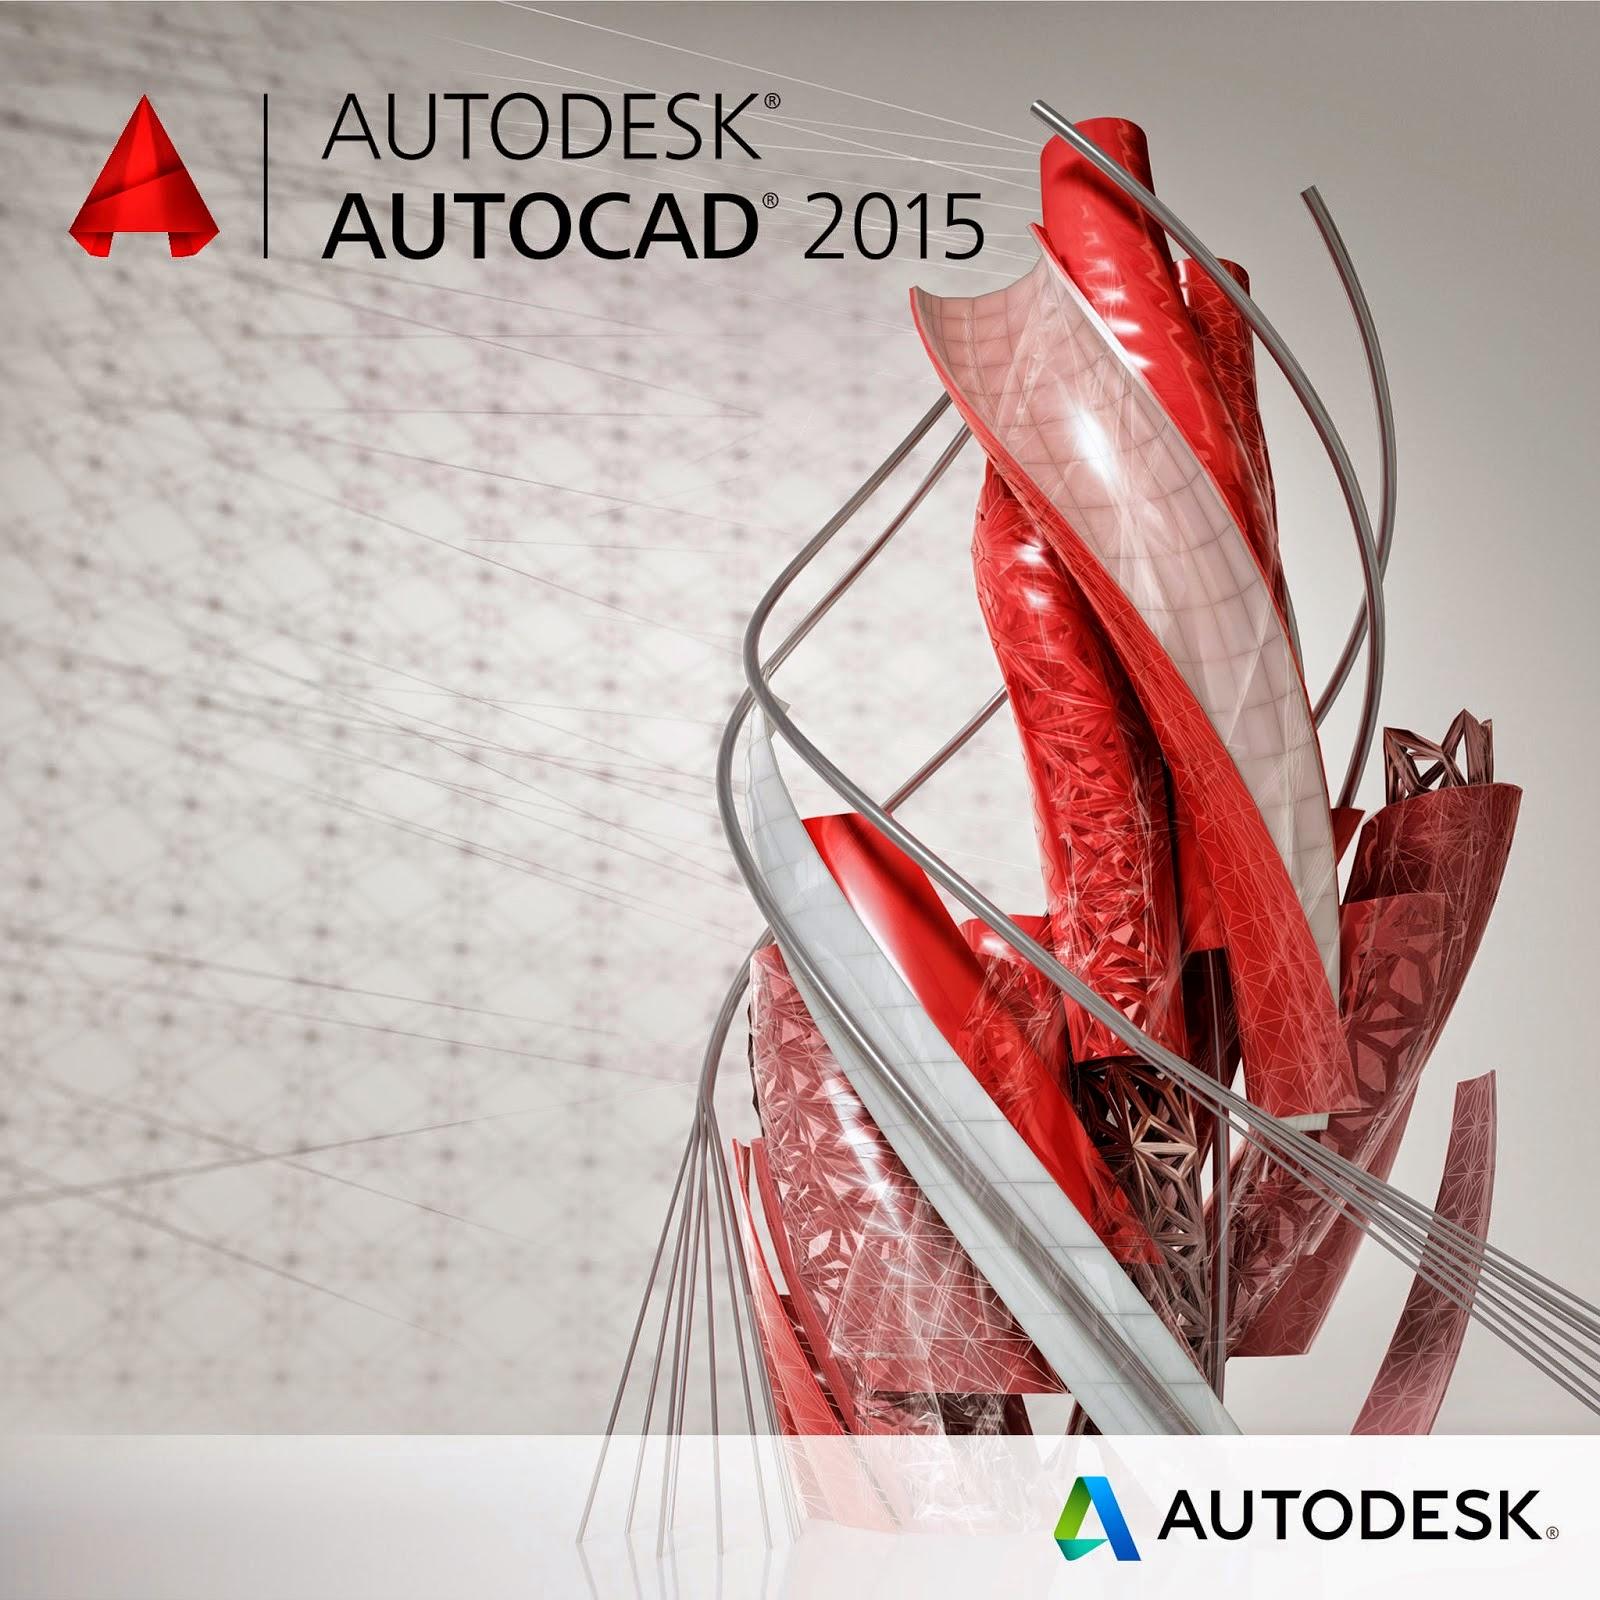 Tải Autocad 2015 Full Crack (32bit +64bit) + Hướng dẫn Crack